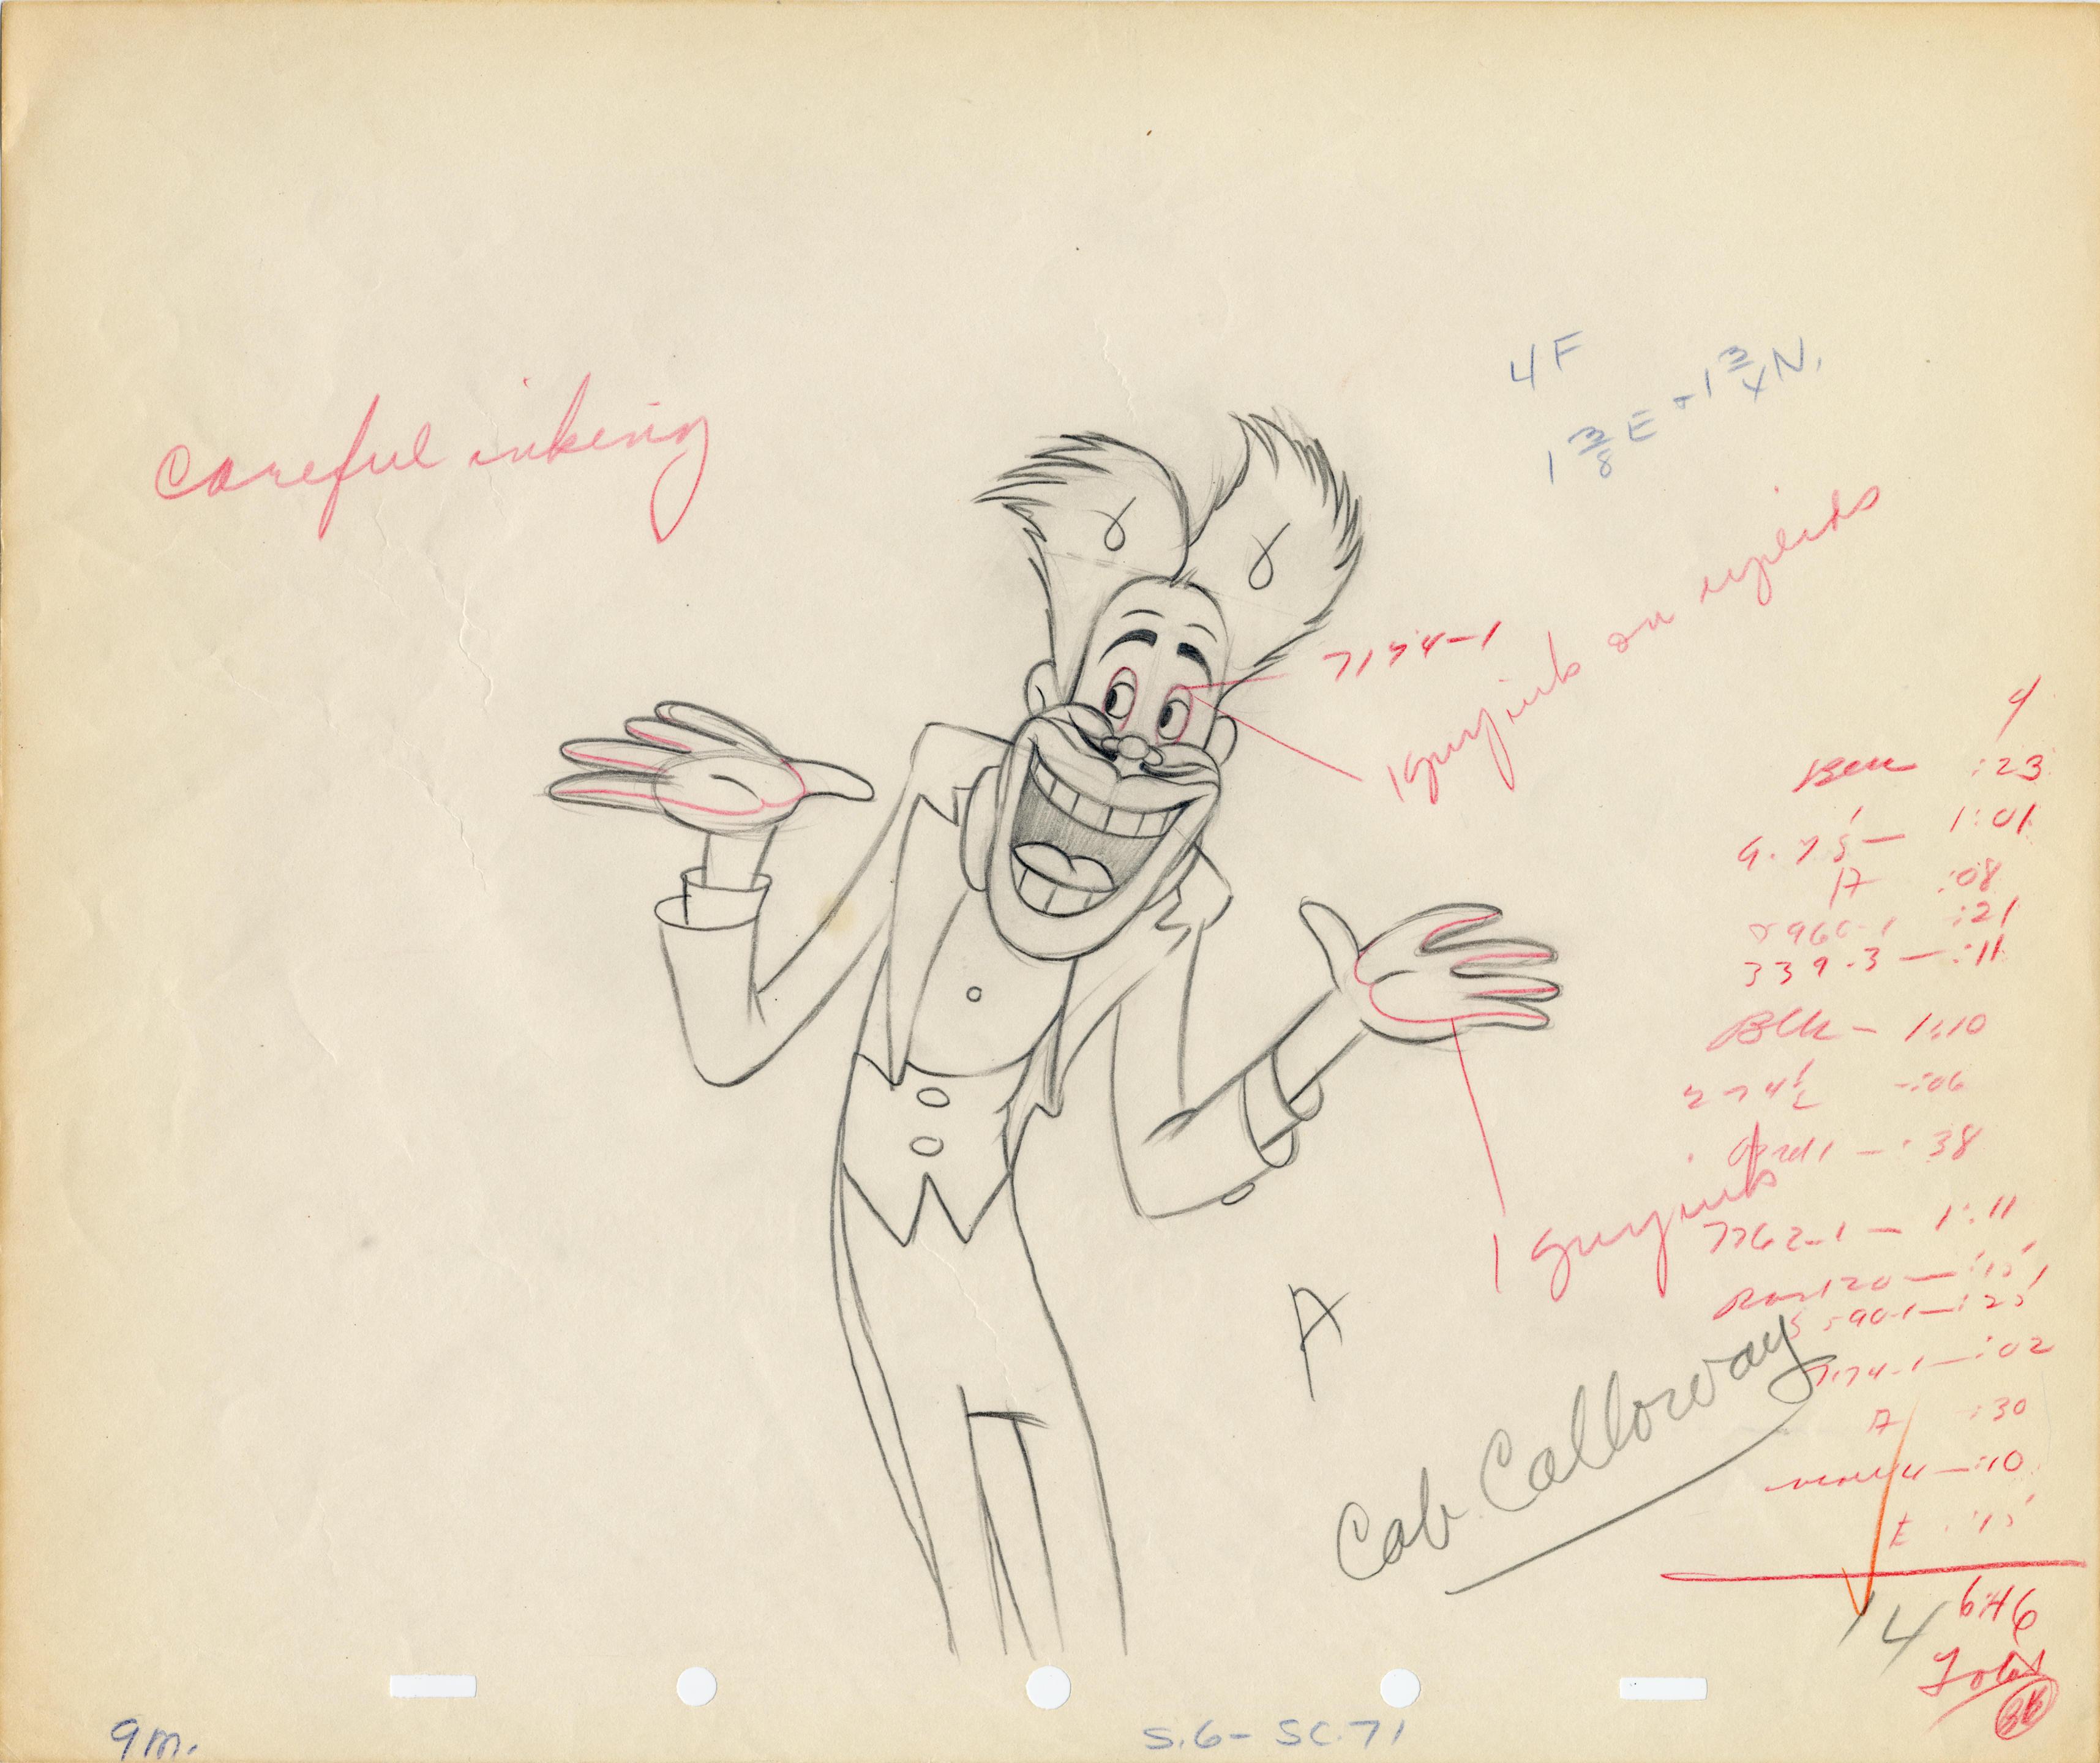 Auktion - Entertainment Memorabilia including Animation Art